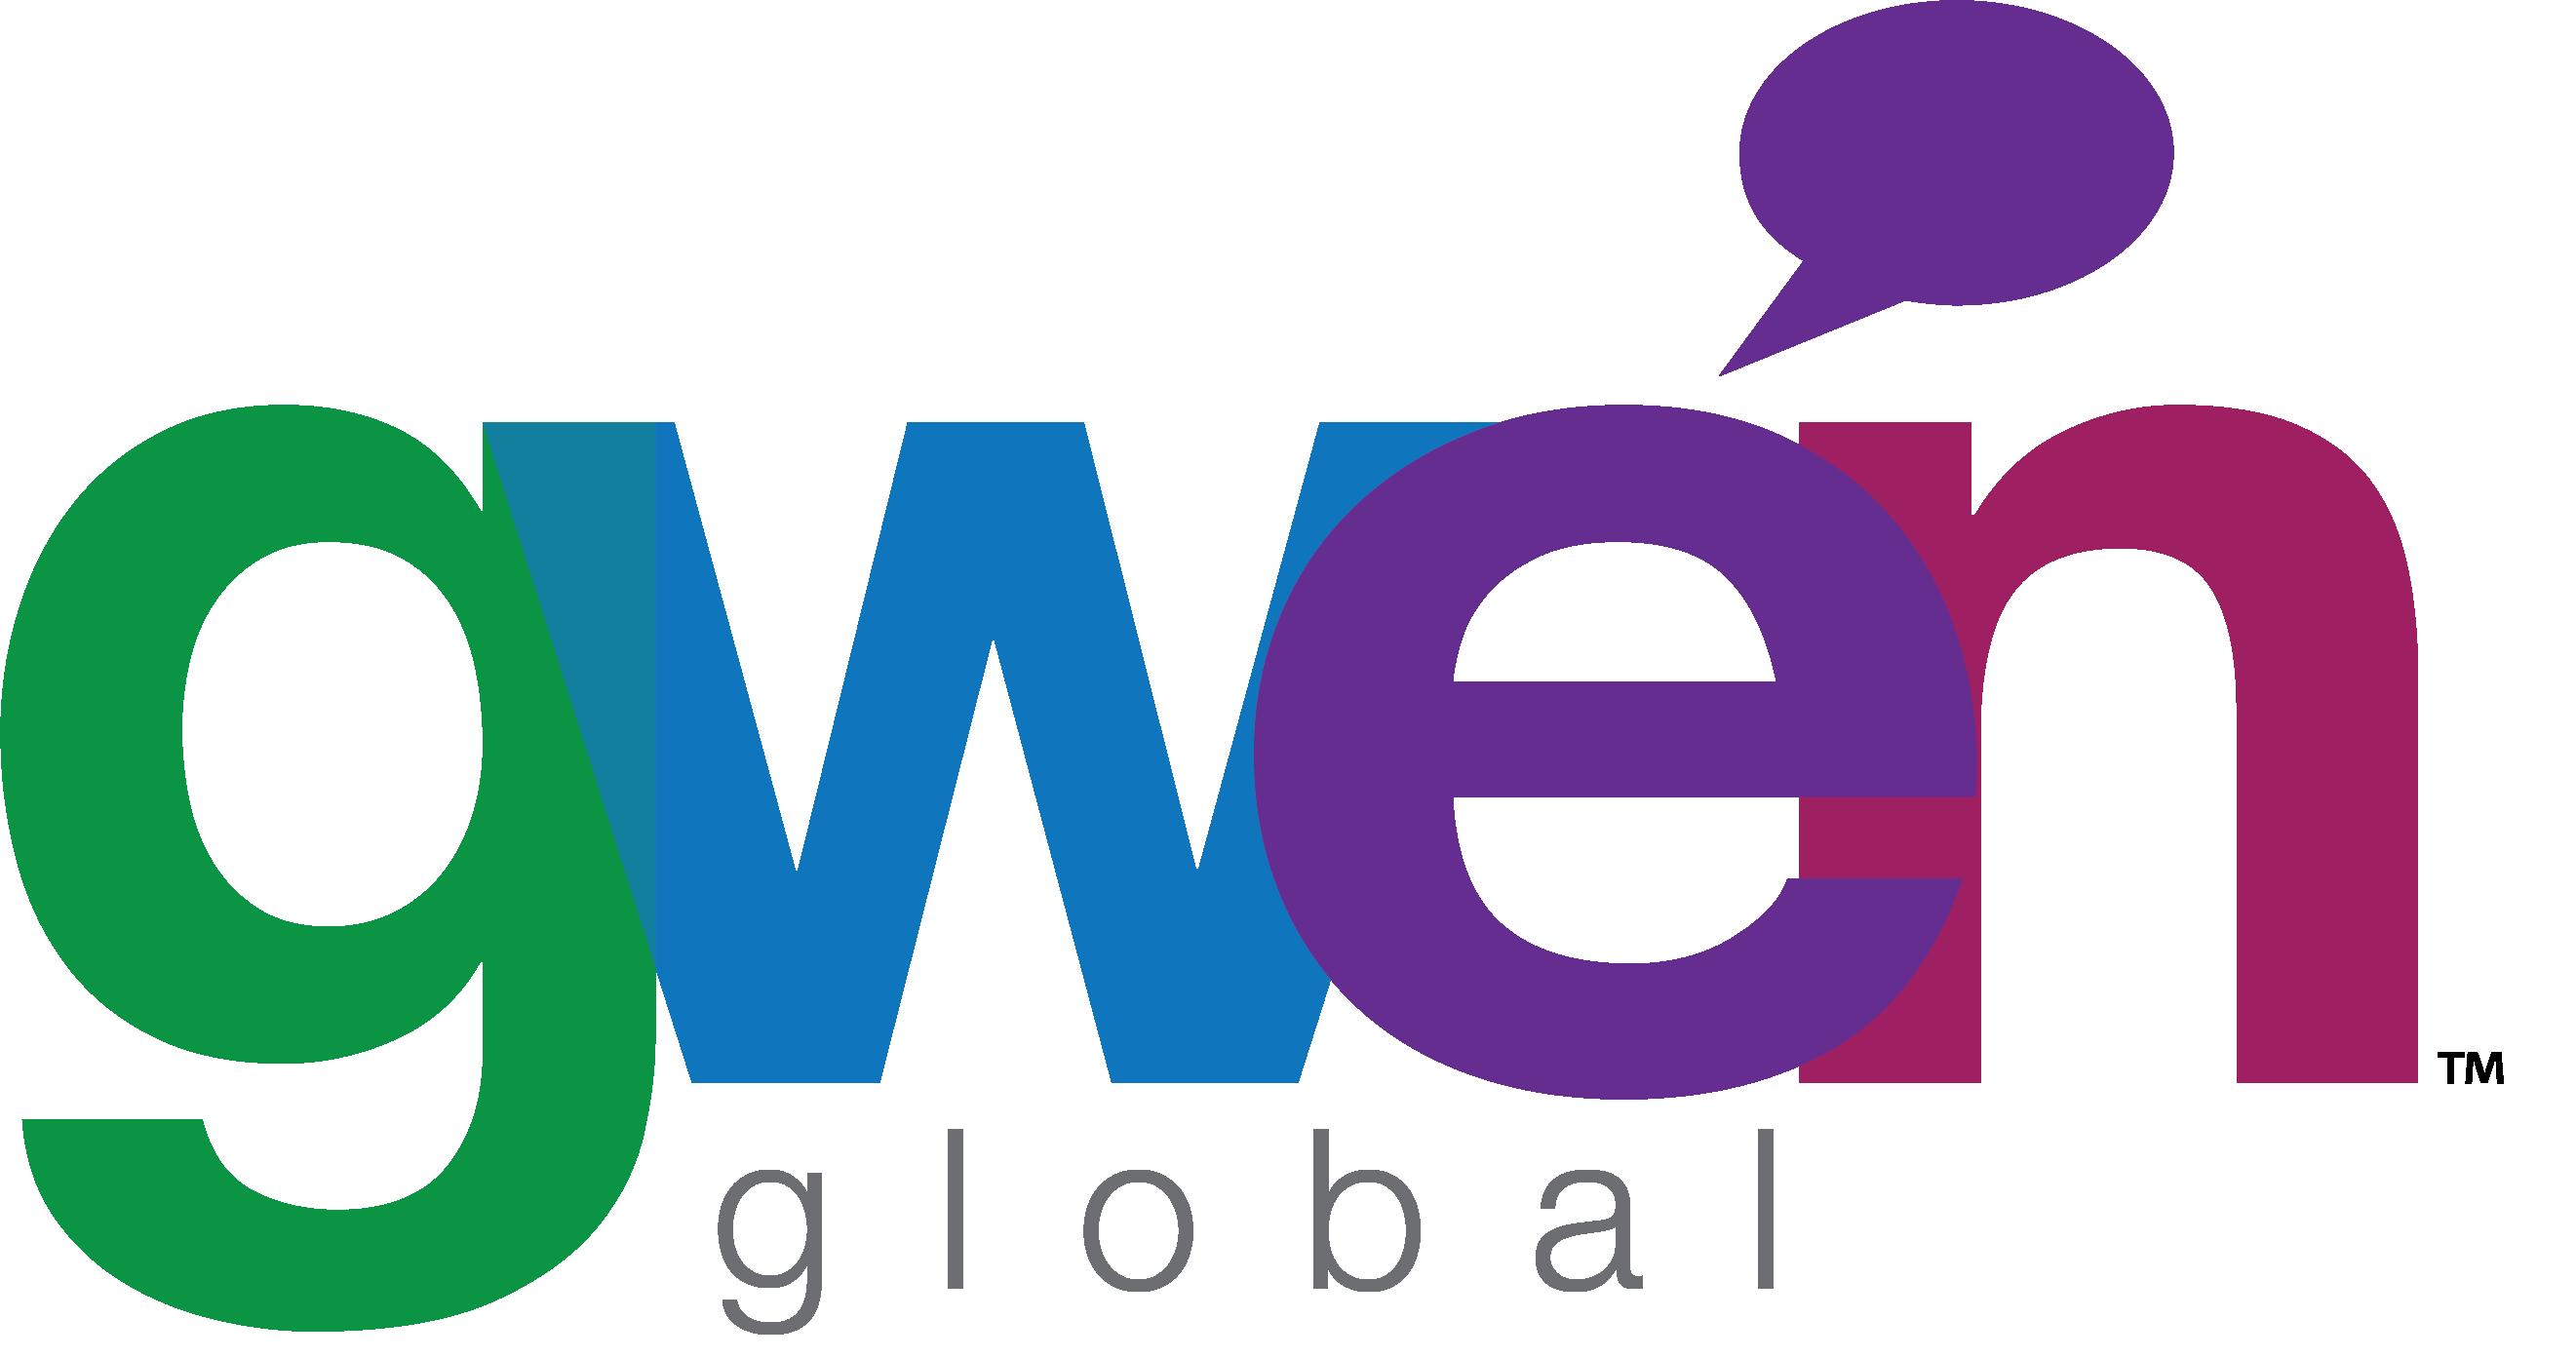 GWEN Global